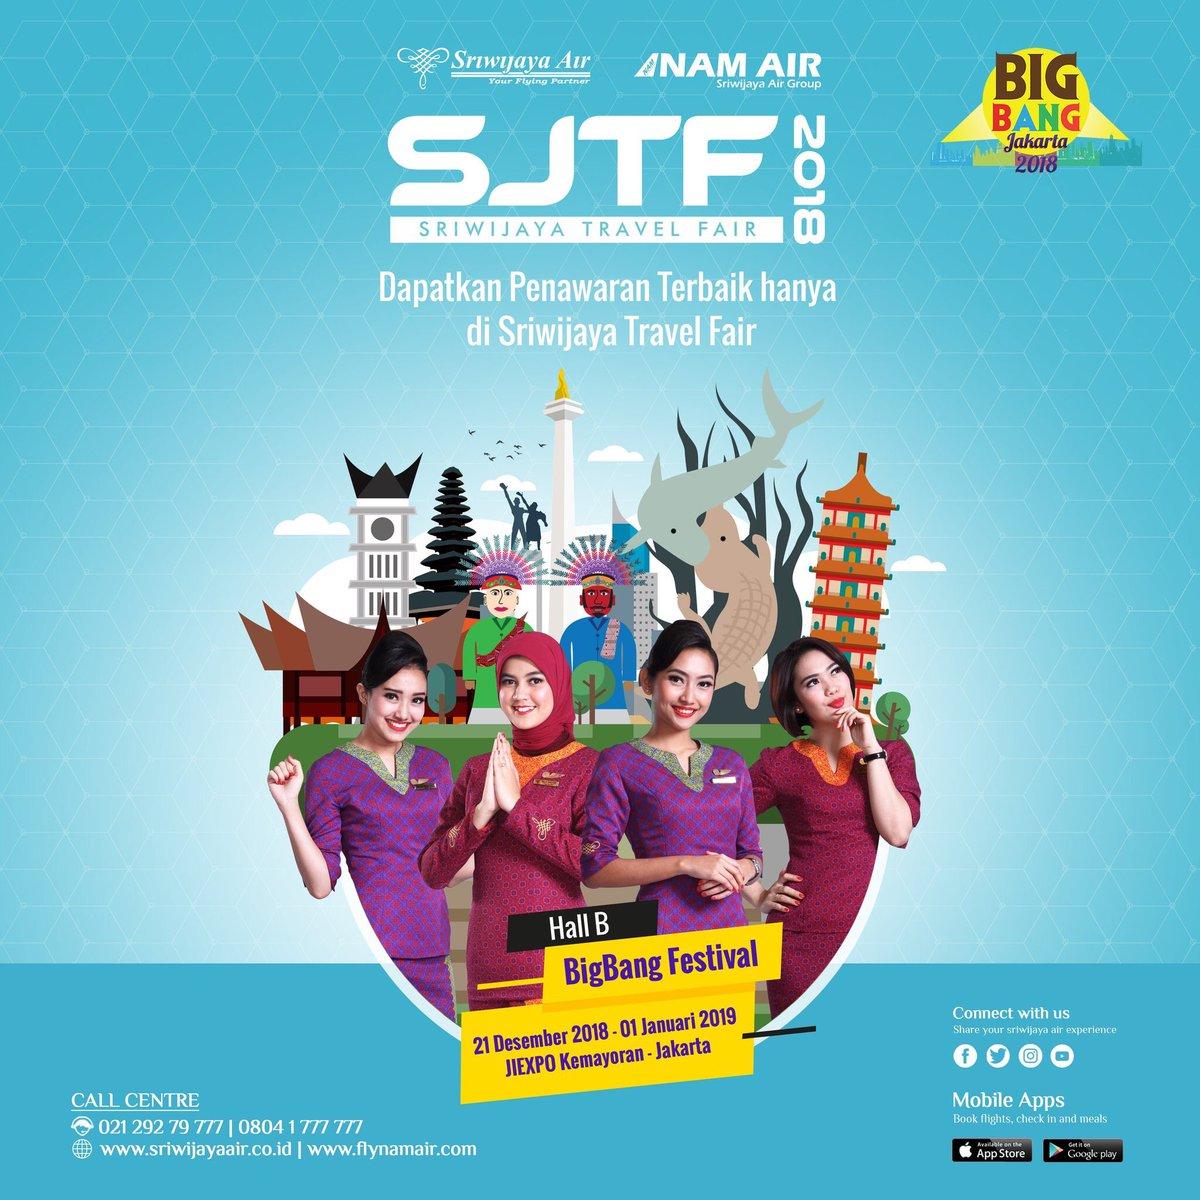 #SriwijayaAir - Promo Event Sriwijaya Travel Fair 2018 (21 Des - 01 Jan 2019)